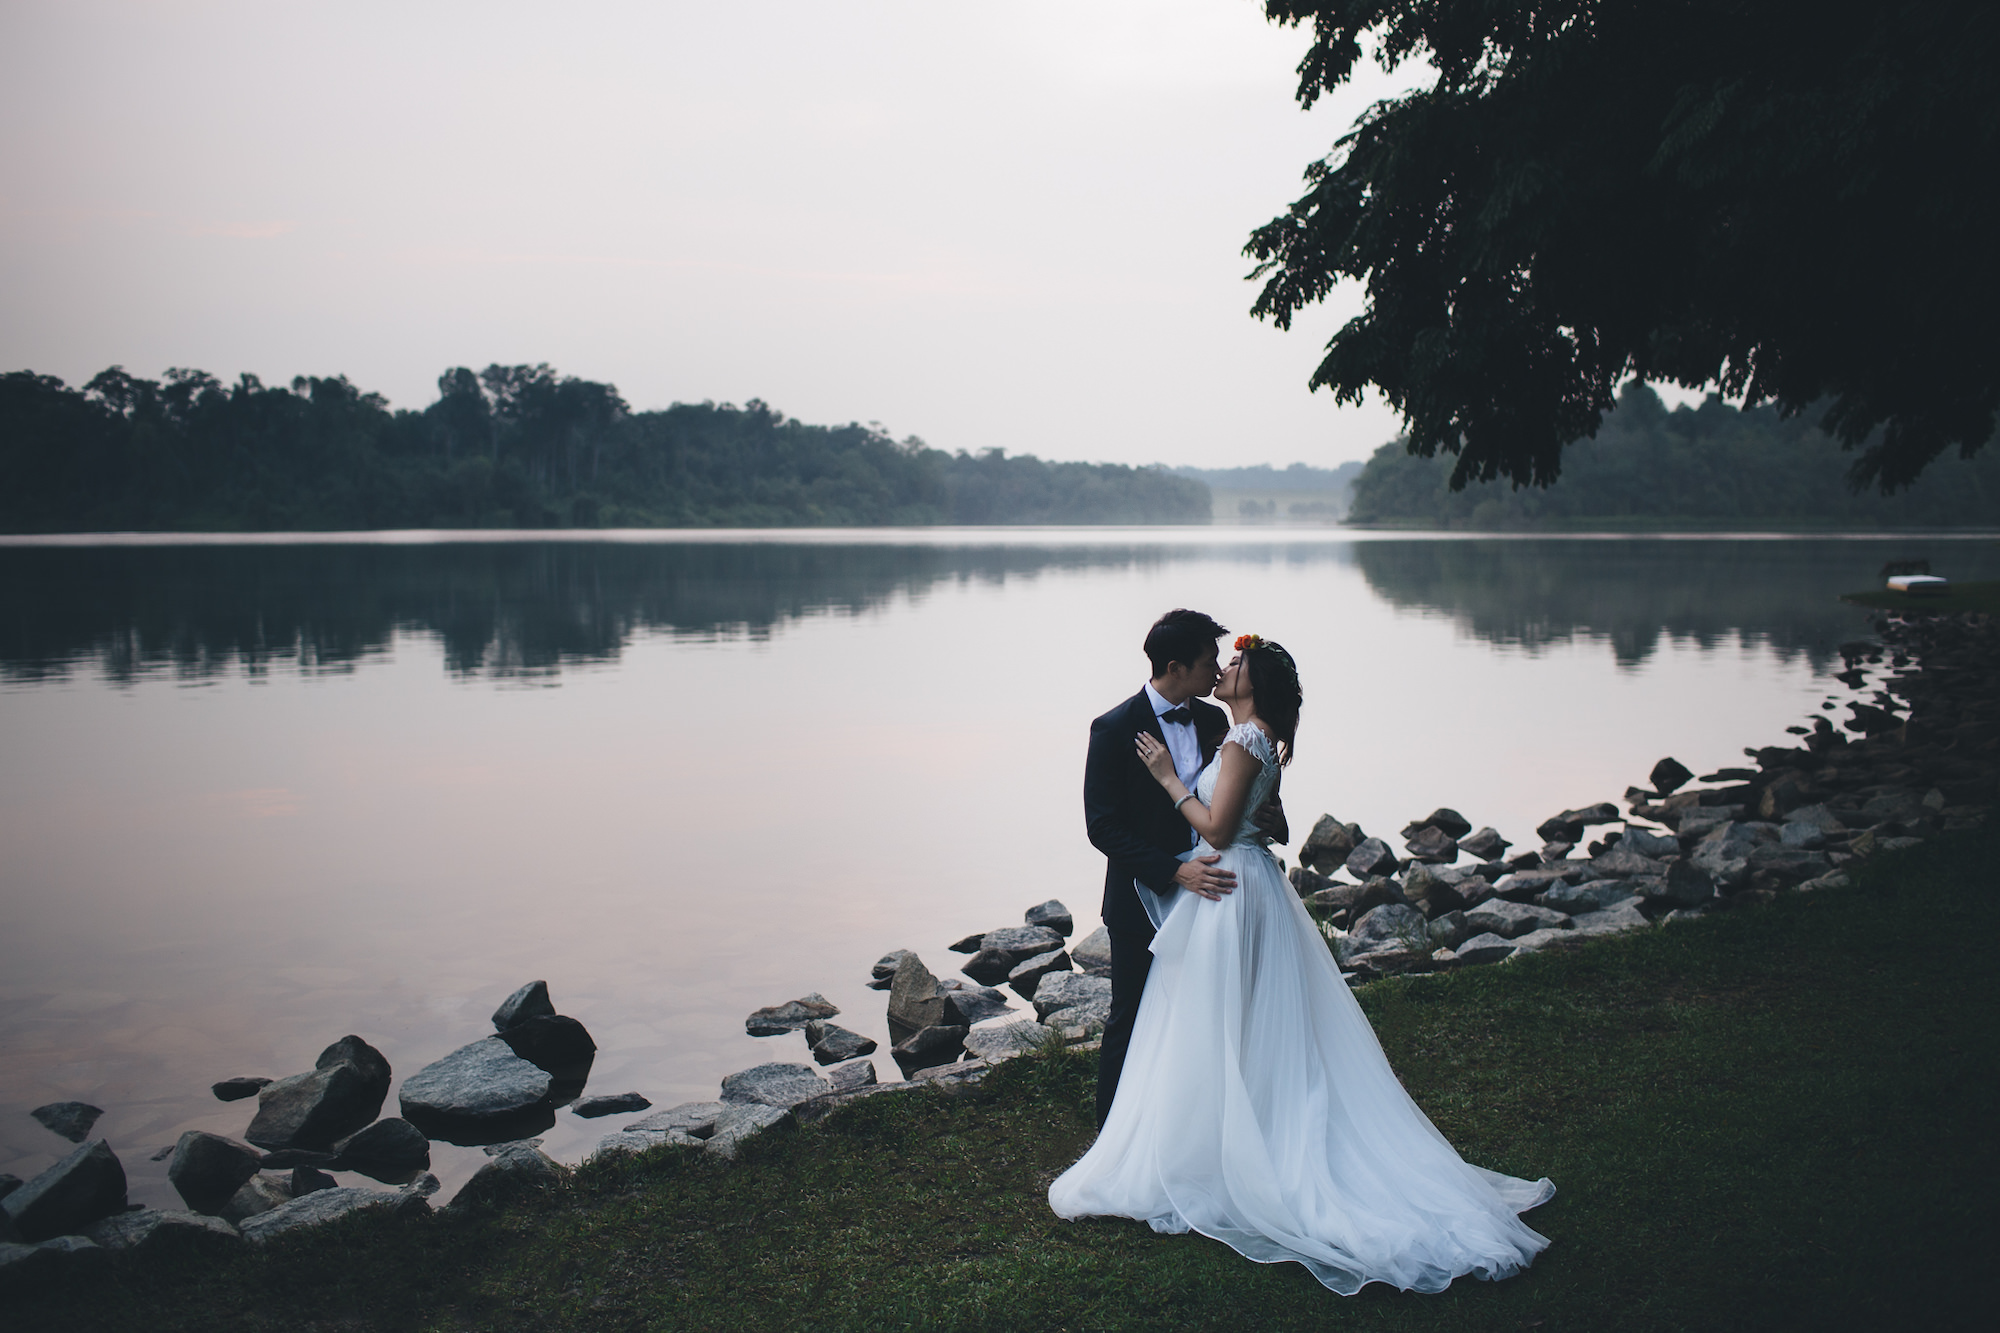 Lynette & Shaun - Singapore Prewedding 14.jpg